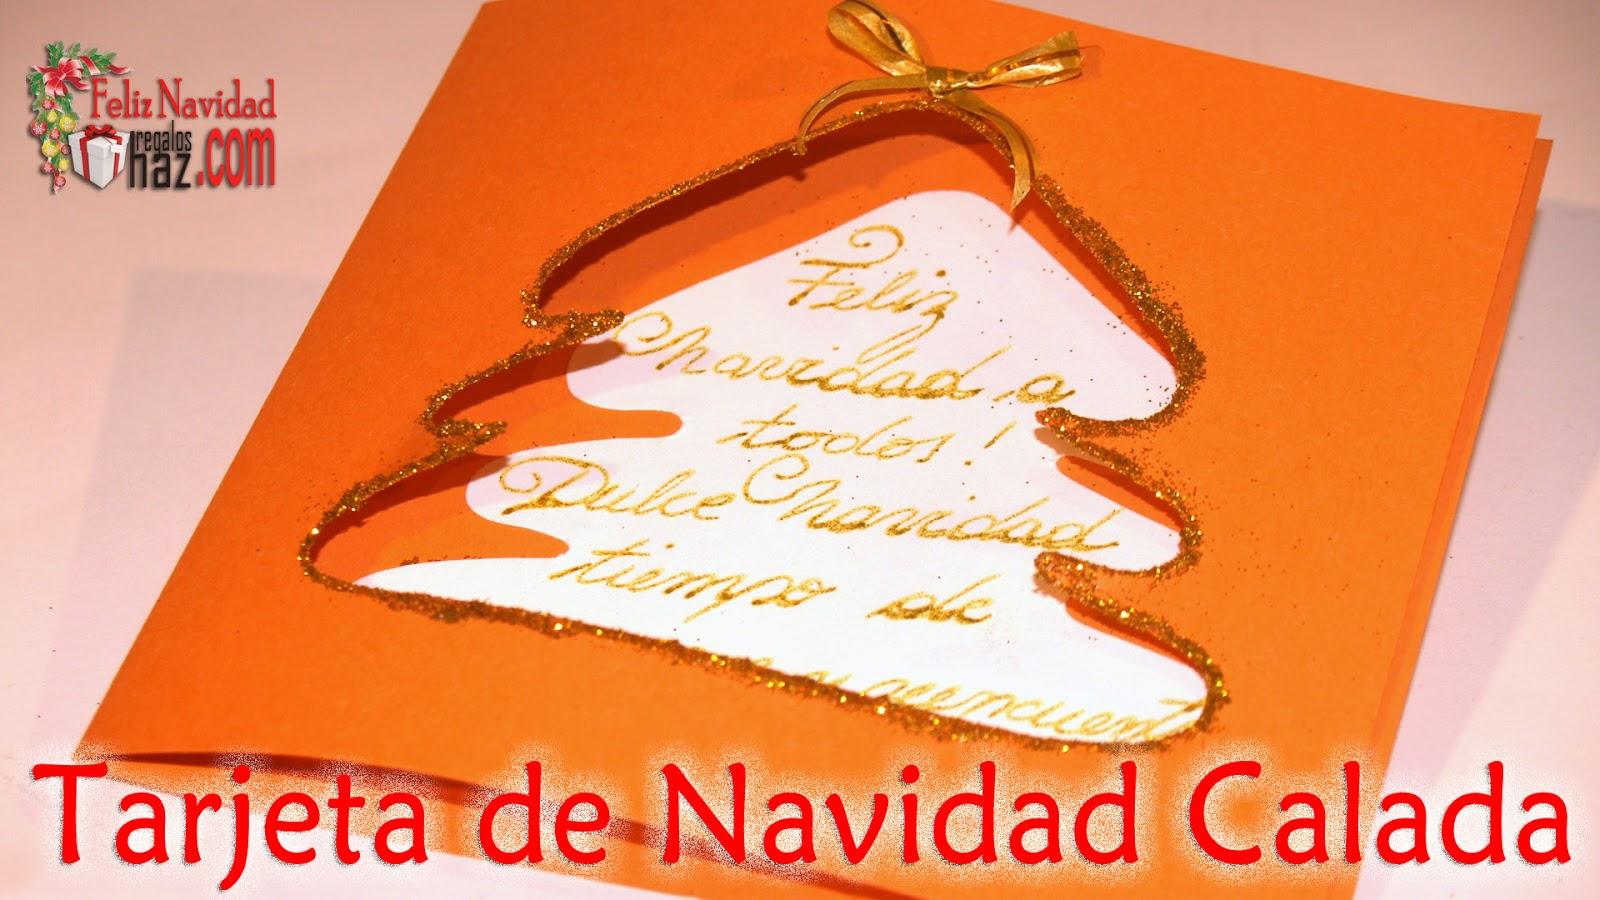 http://hazregalos.blogspot.co.uk/2012/11/tarjeta-calada-navidena.html